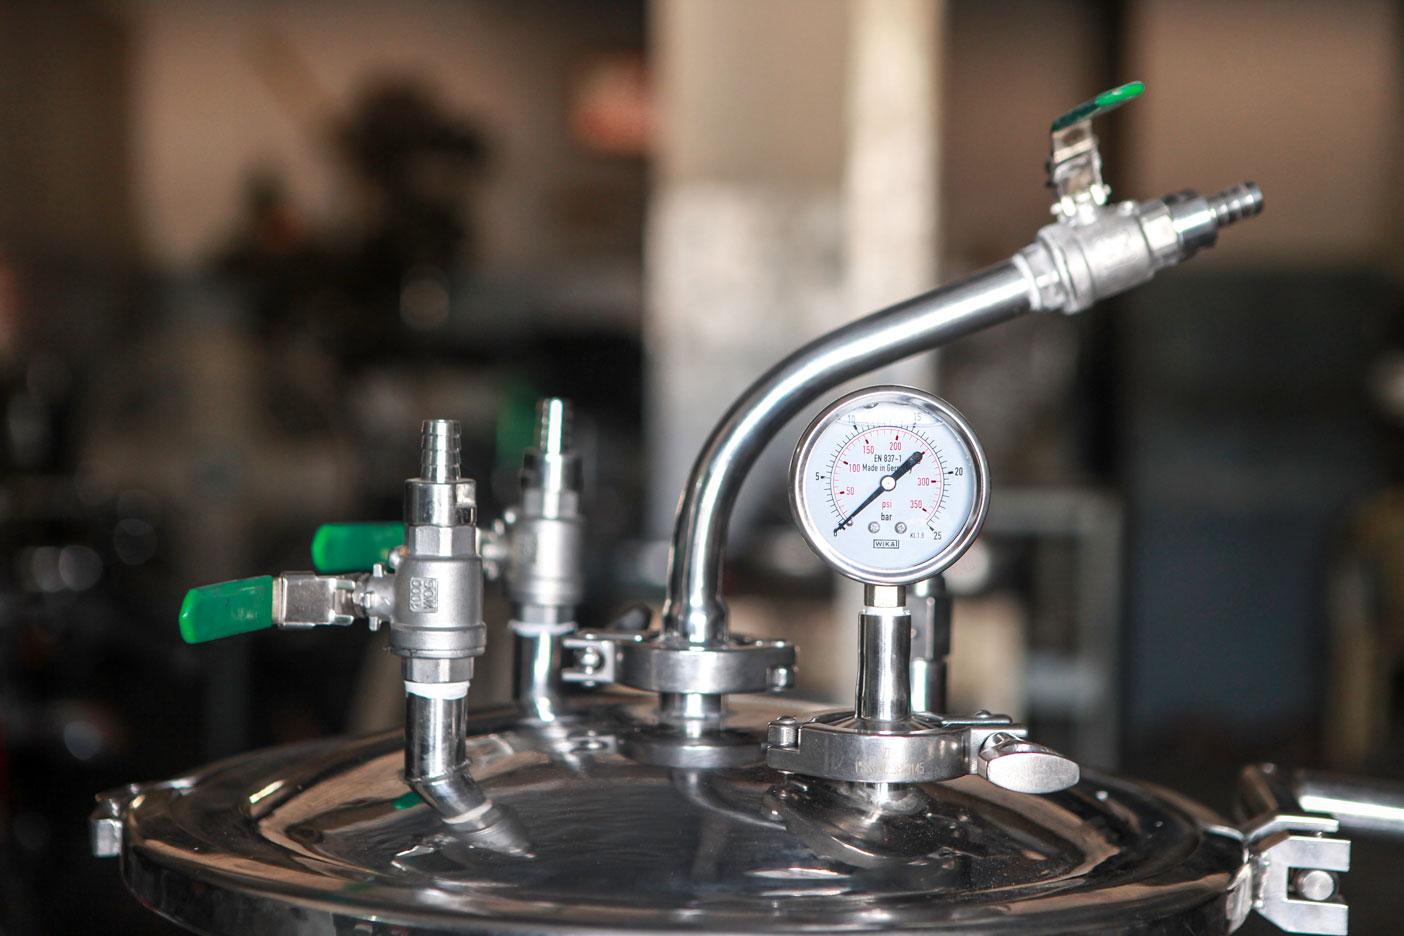 S.S Pressure Vessels